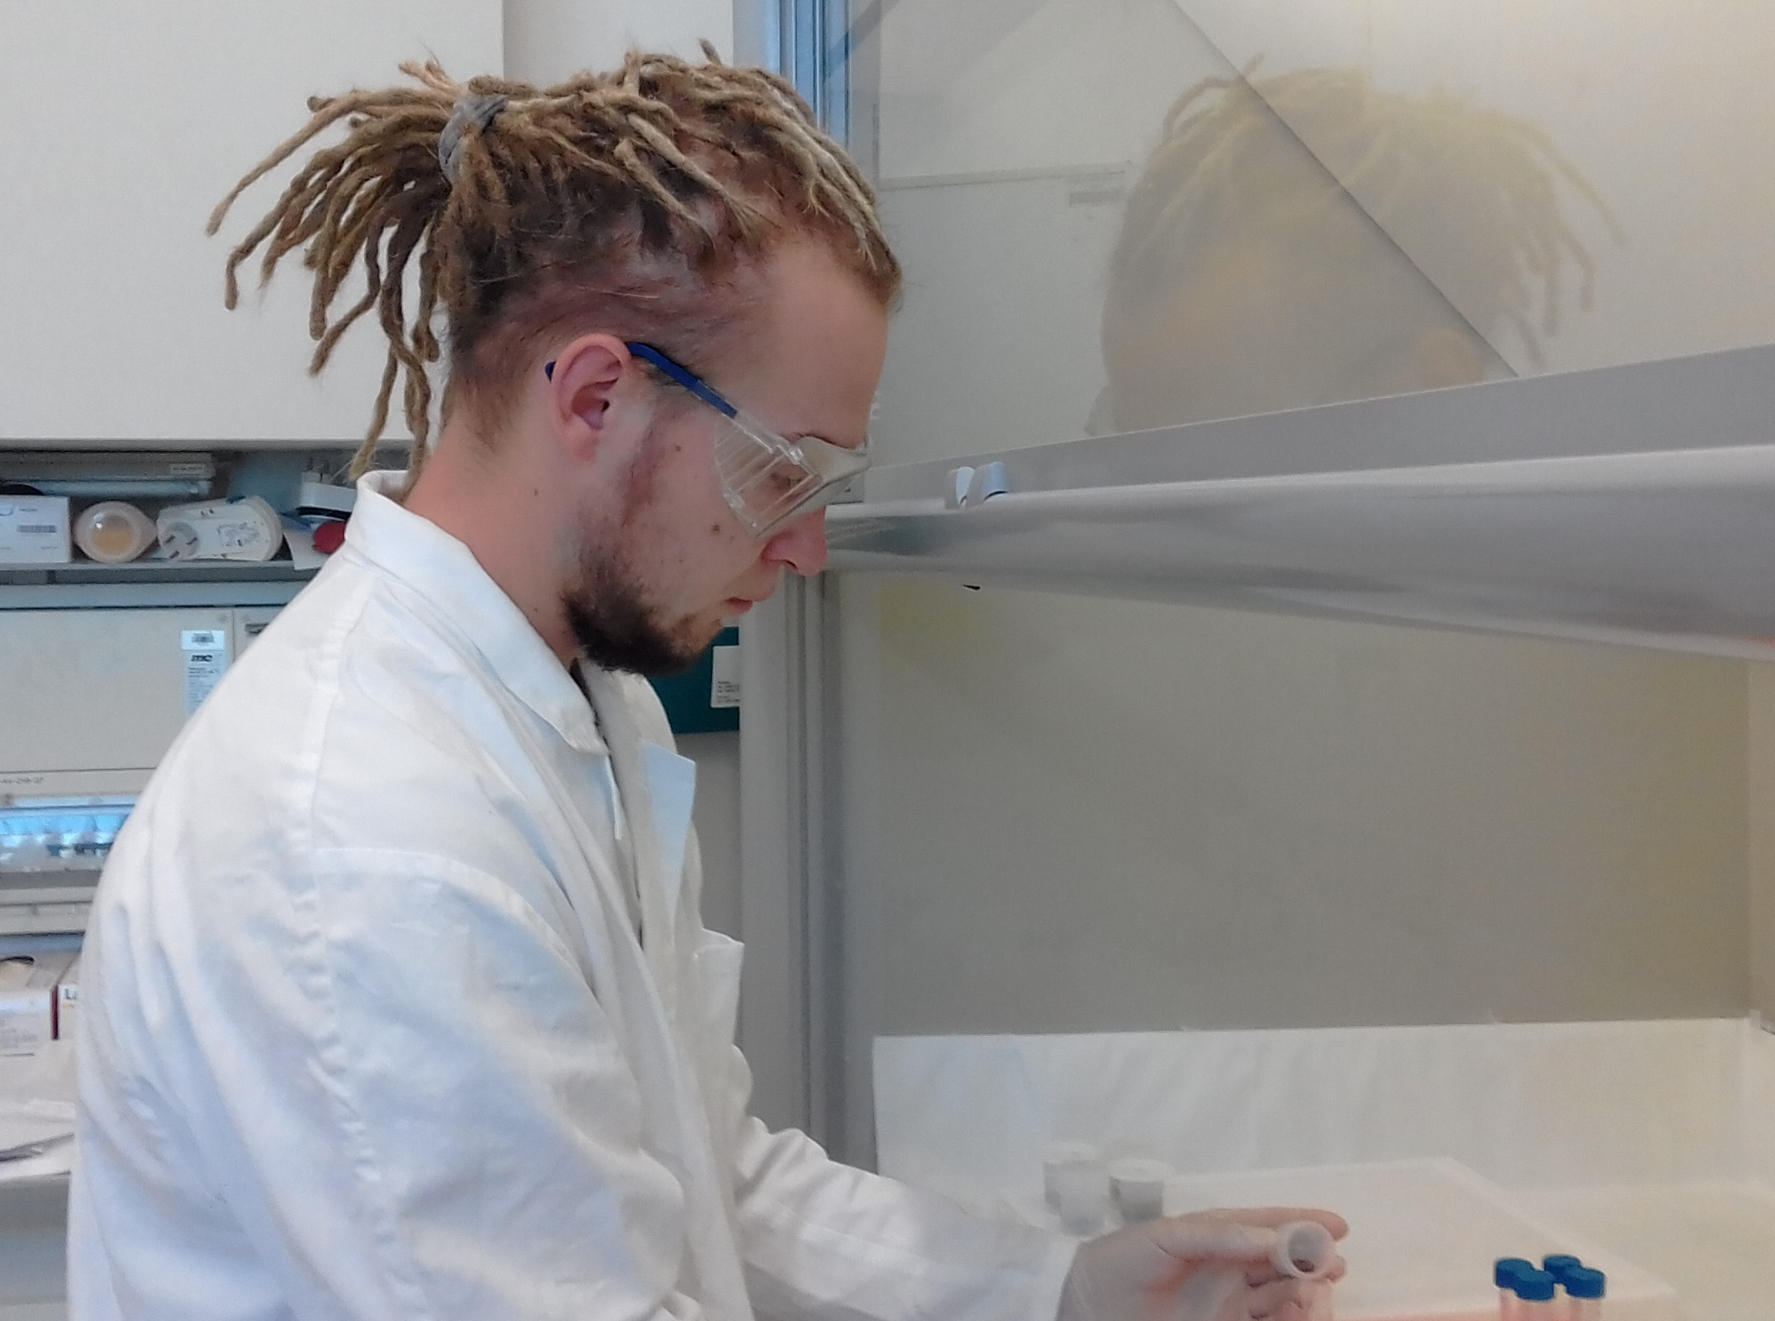 kosmogene dating lab